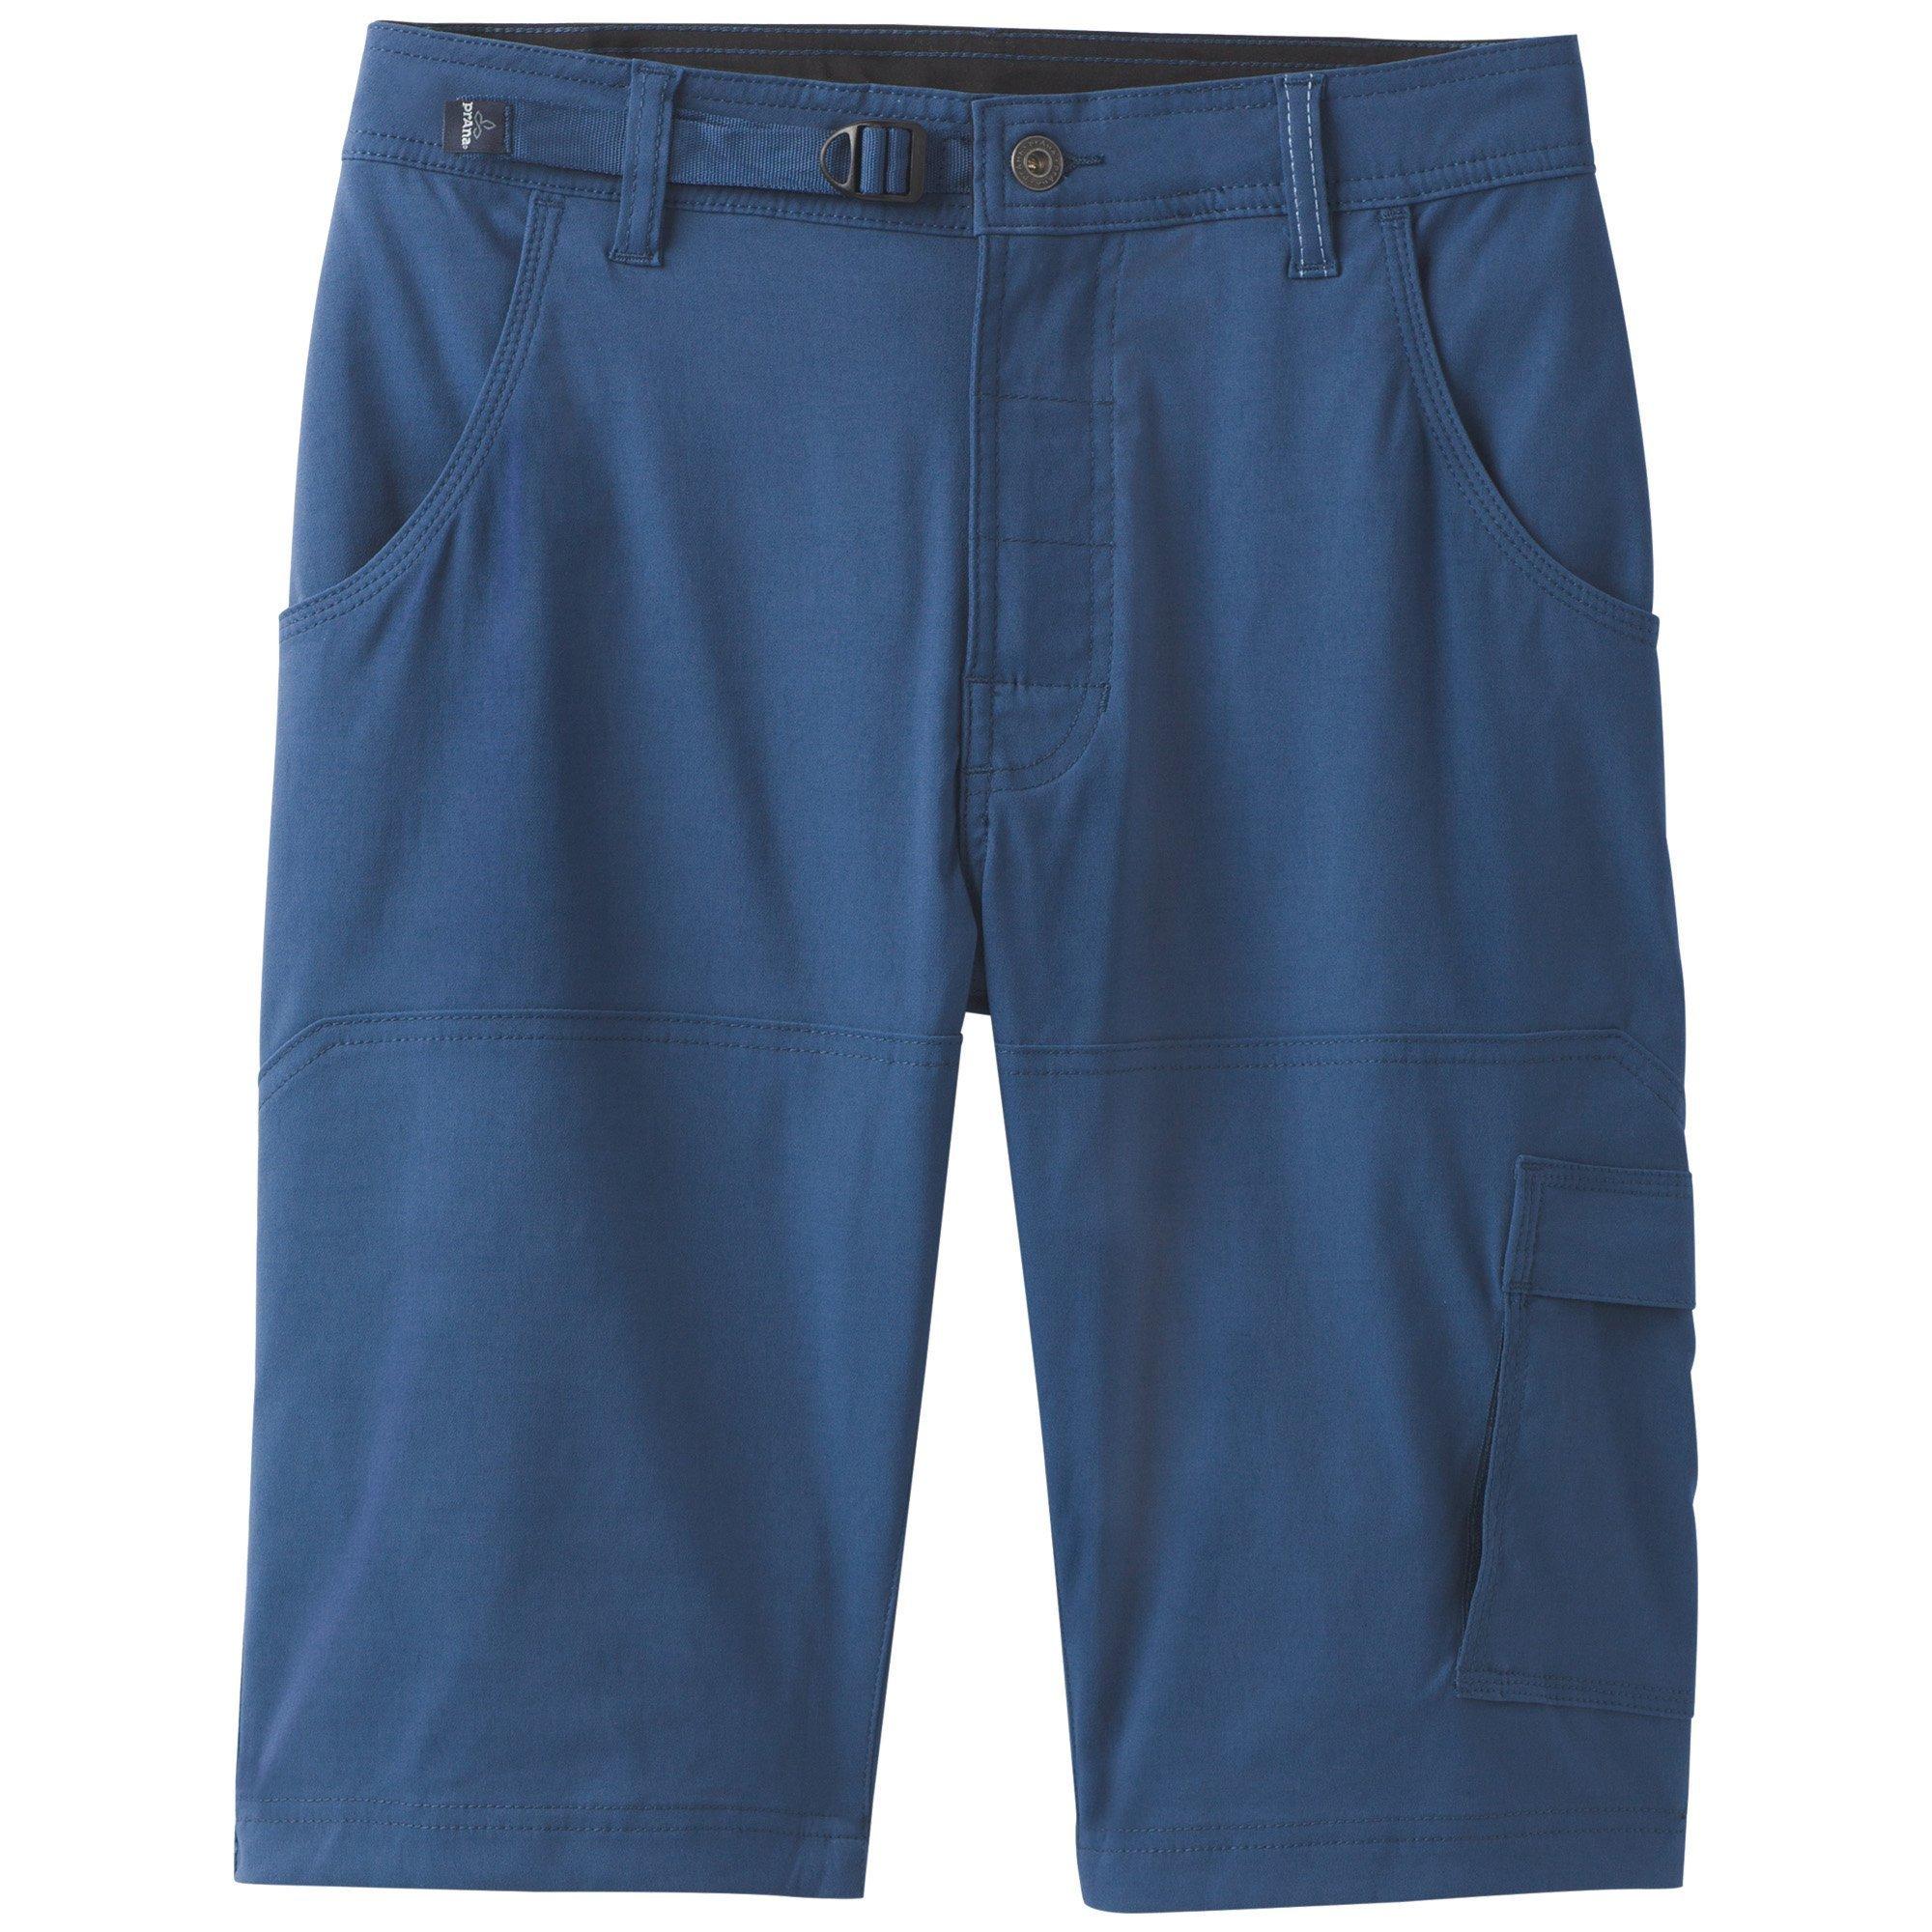 prAna Stretch zion Shorts, Equinox Blue, Size 36